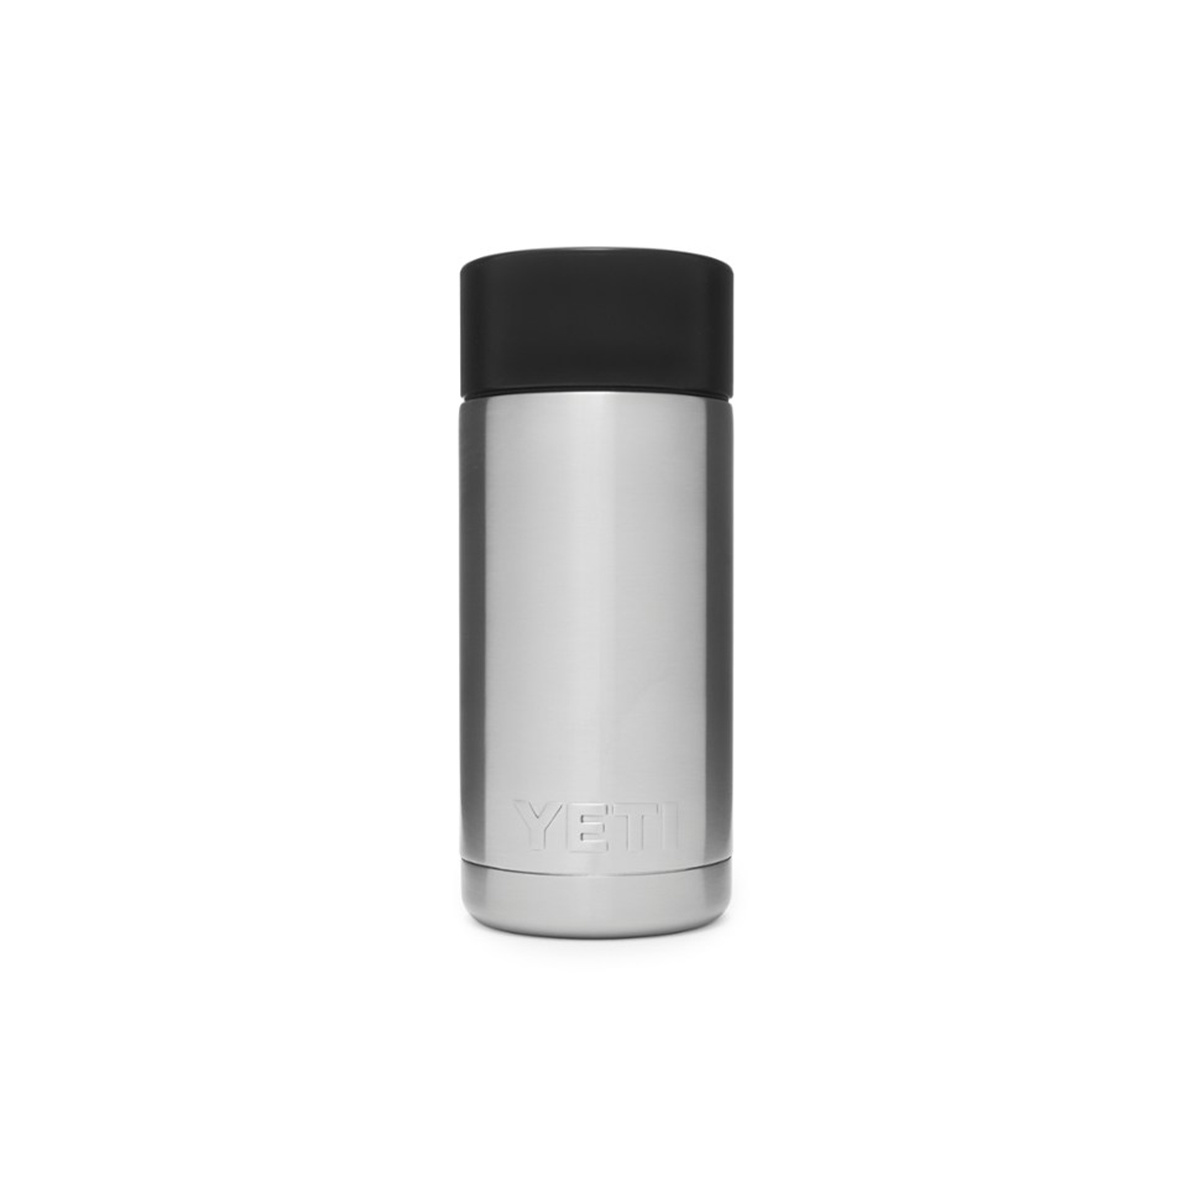 12ac49ed971 Yeti Rambler 12 oz Bottle - Gearhead Outfitters